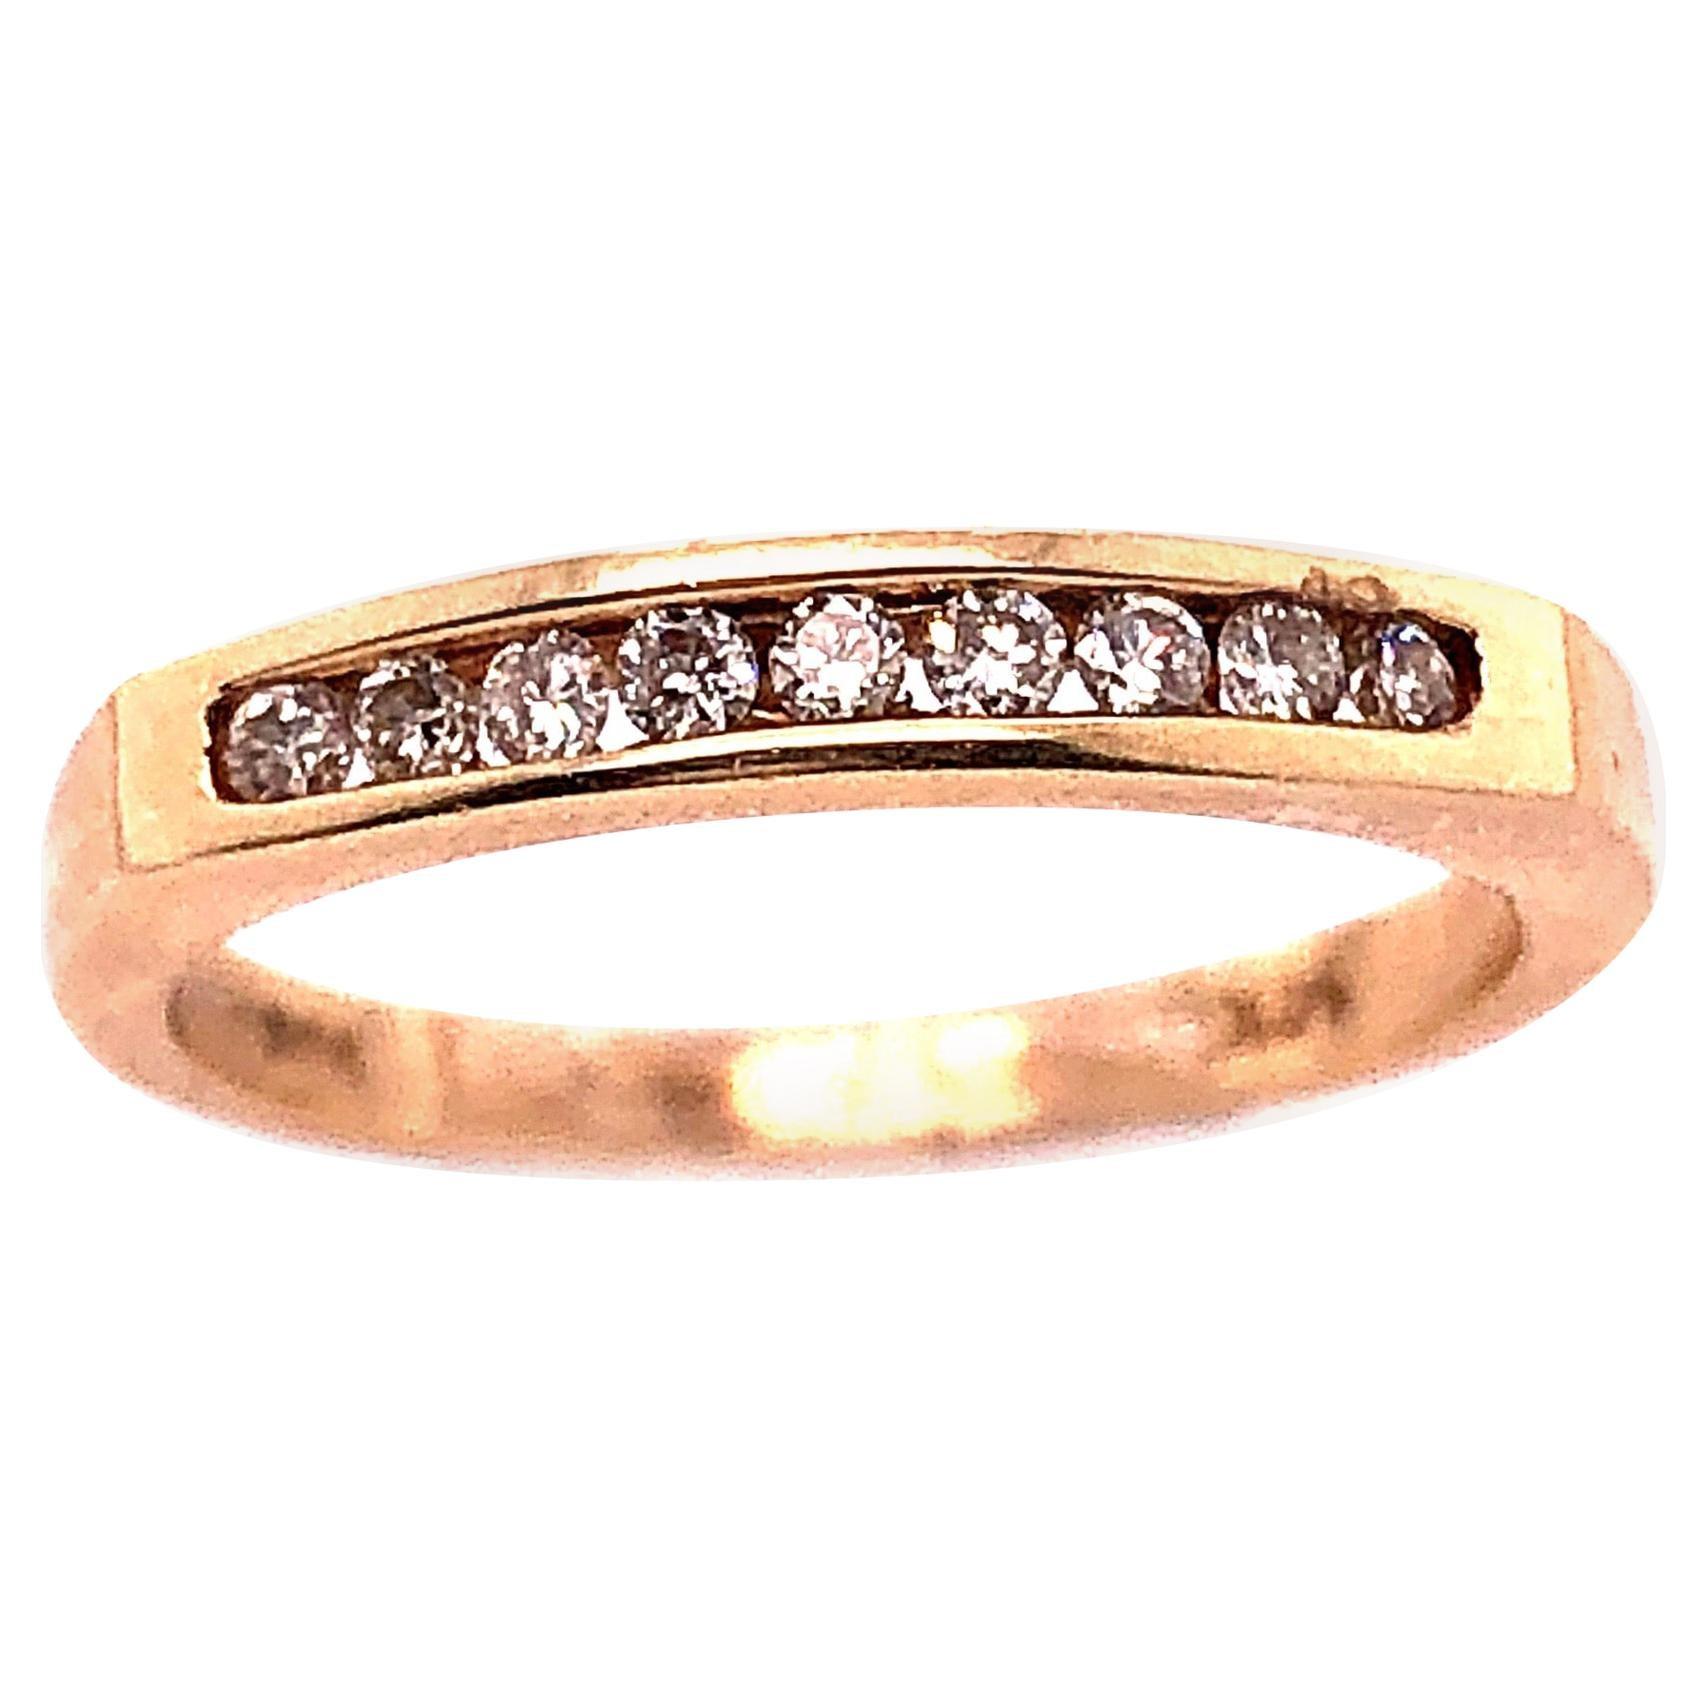 14 Karat Yellow Gold Diamond Band Wedding Anniversary Bridal Ring